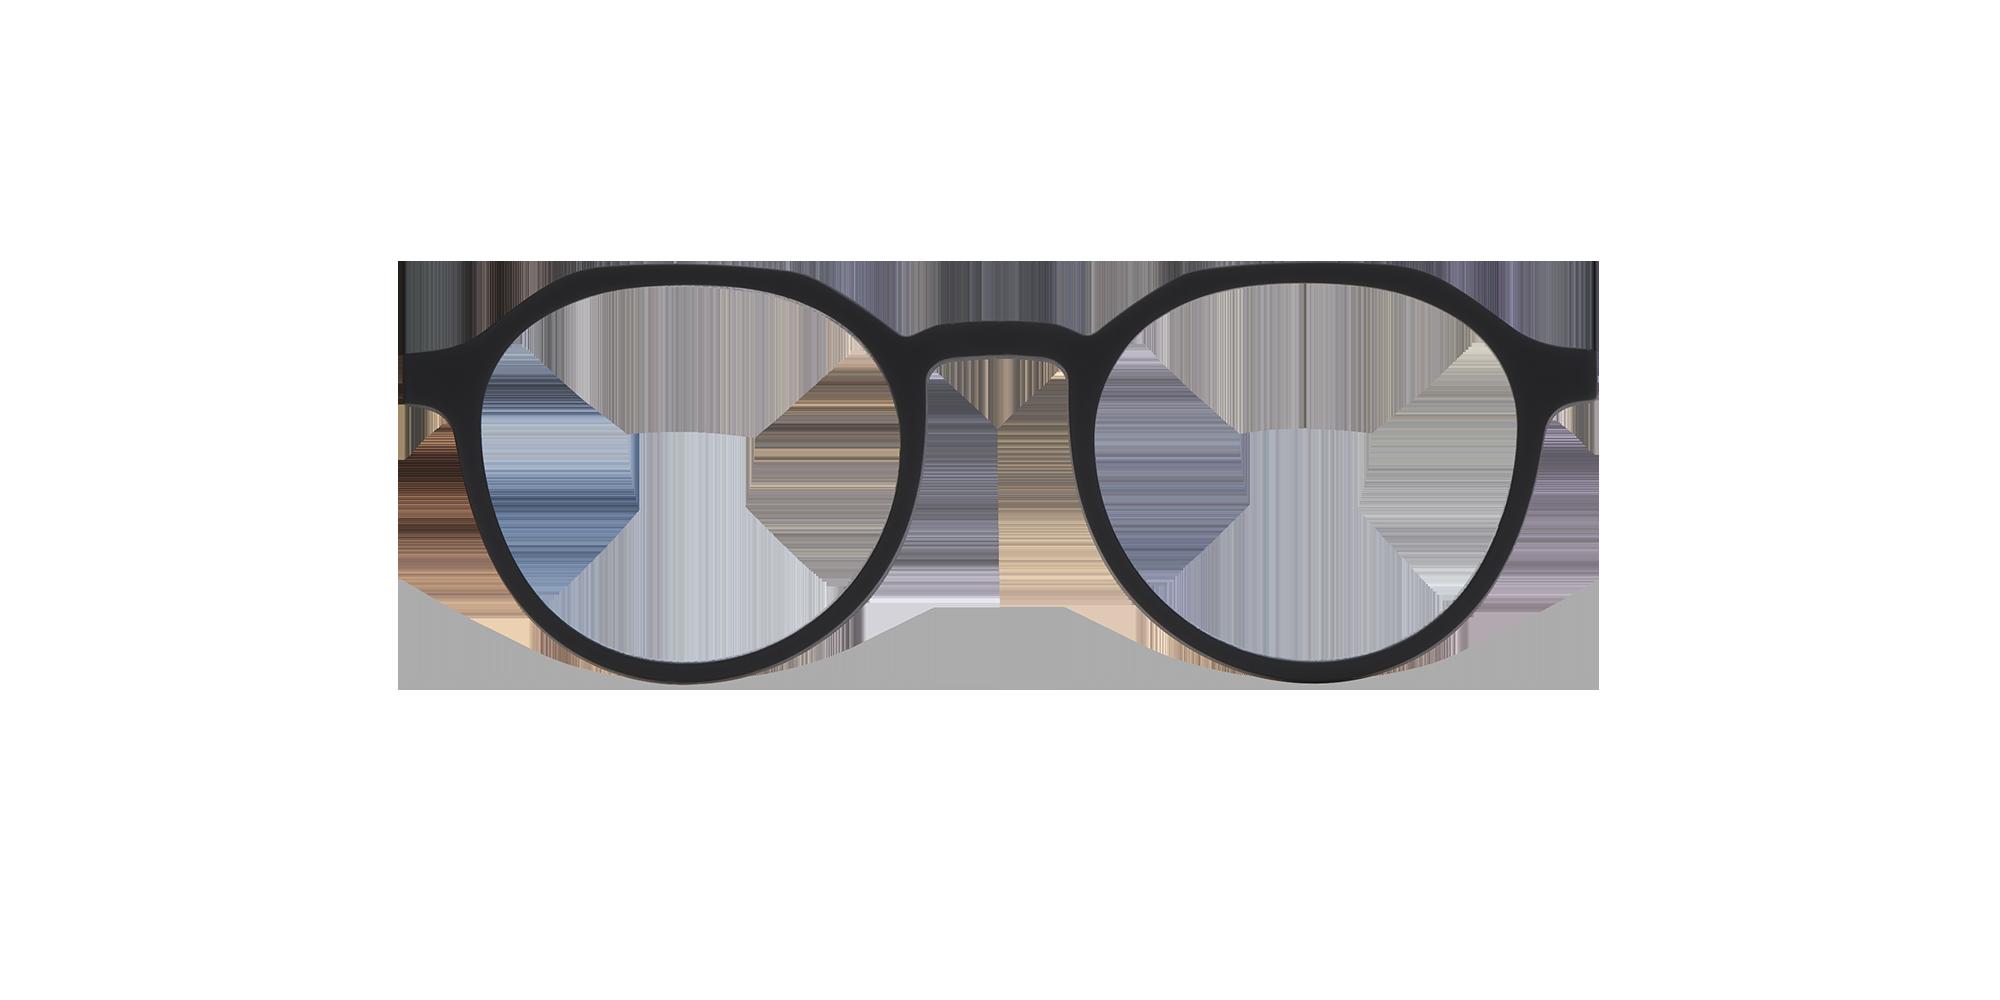 afflelou/france/products/smart_clip/clips_glasses/07630036429075_face.png